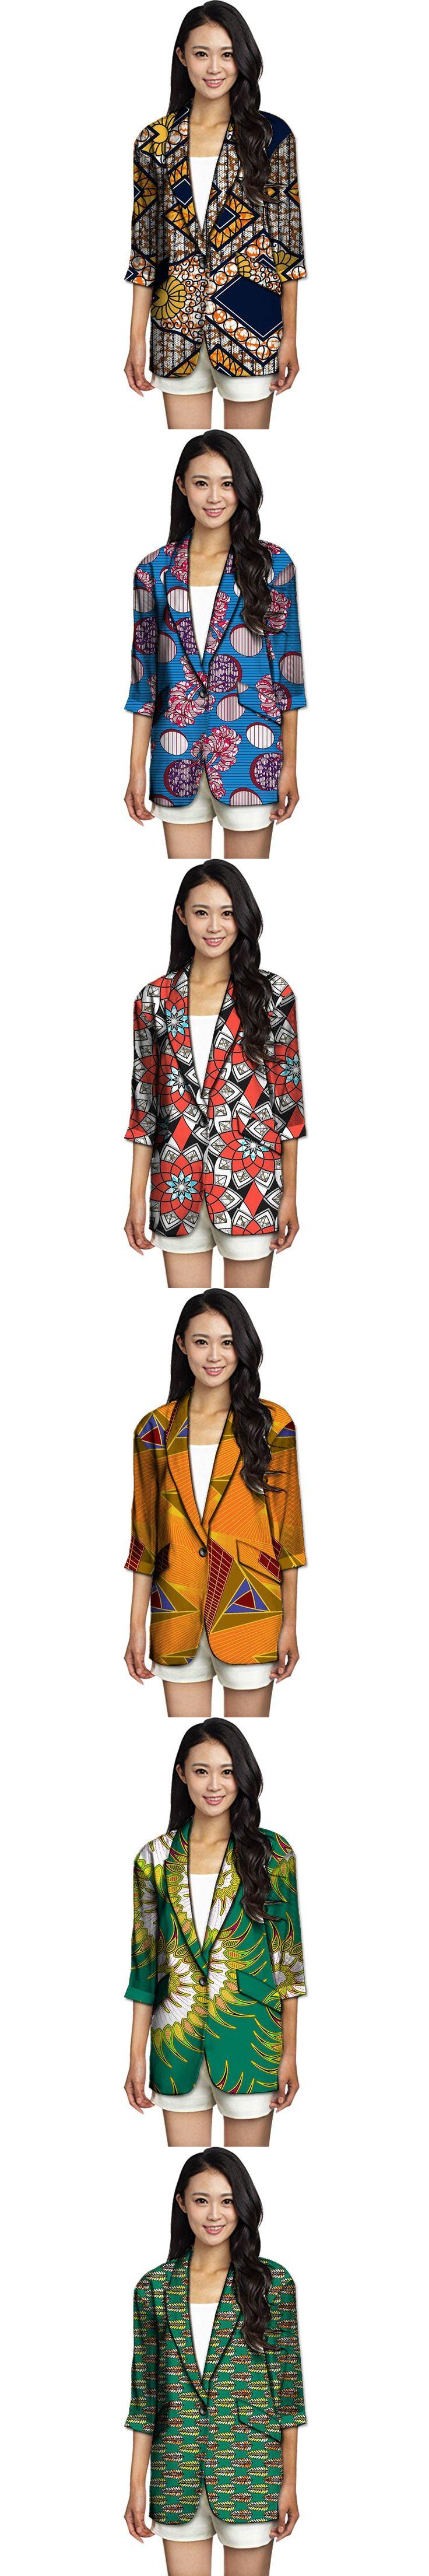 Women African Suit Jackets Casual Fashion Blazer Coats Africa Printed Customize Made Ladies Dashiki Clothing